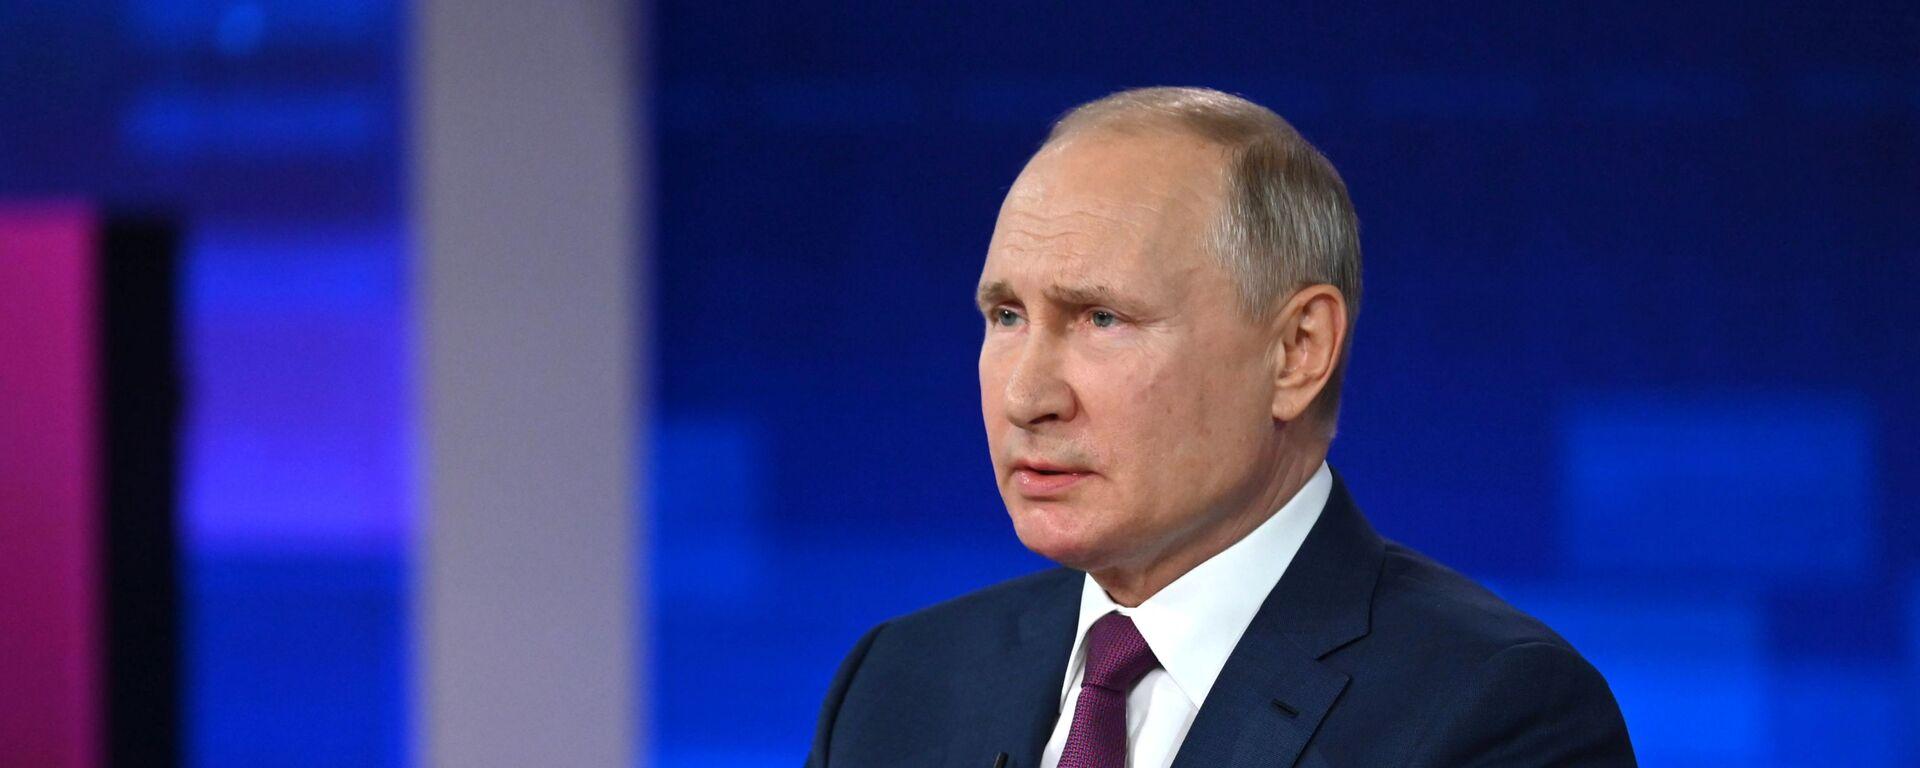 Президент РФ Владимир Путин  - Sputnik Грузия, 1920, 14.09.2021